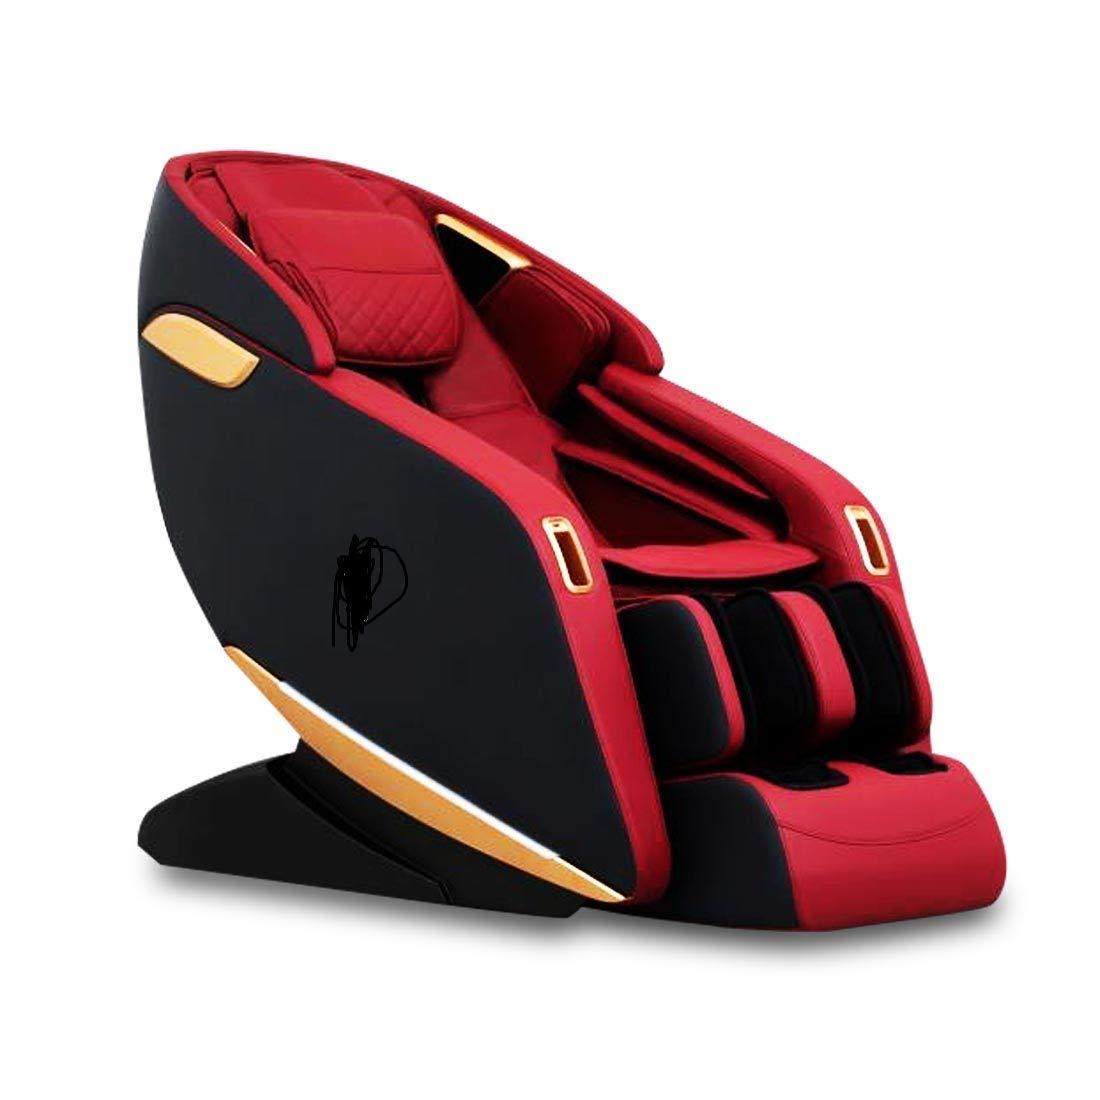 SOBO 3D Latest AI Intelligence Voice Control SL-Track Thai Yoga Stretch Zero Gravity Full Body Shiatsu Heating with Foot Massage